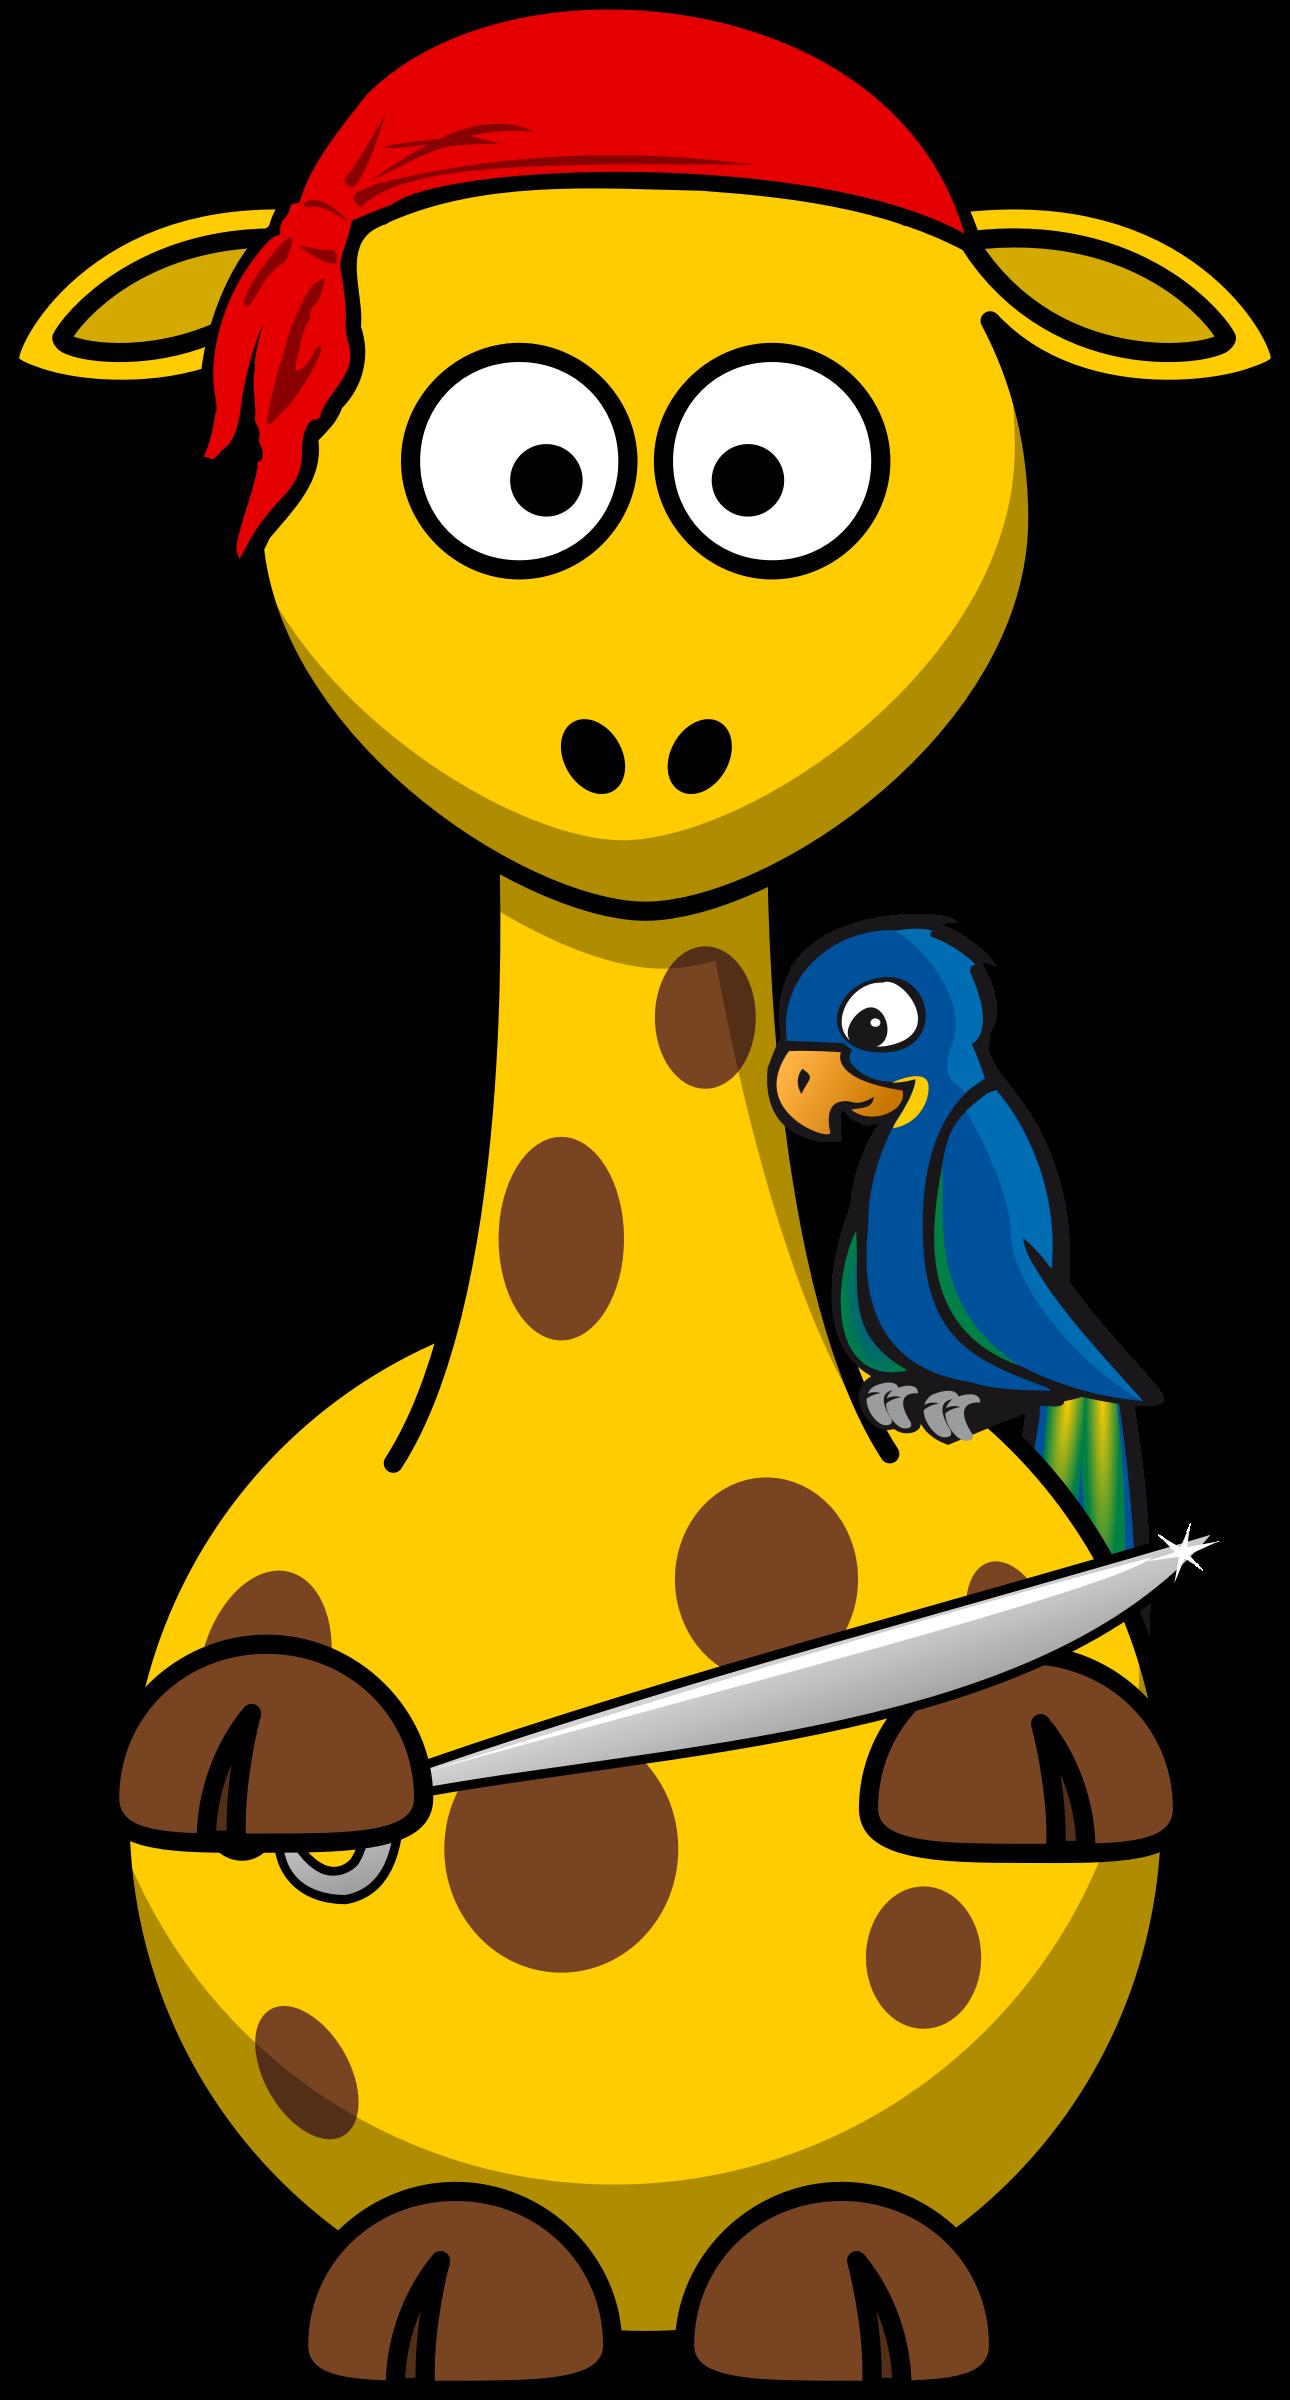 Giraffe clipart profile. Pirate big image png